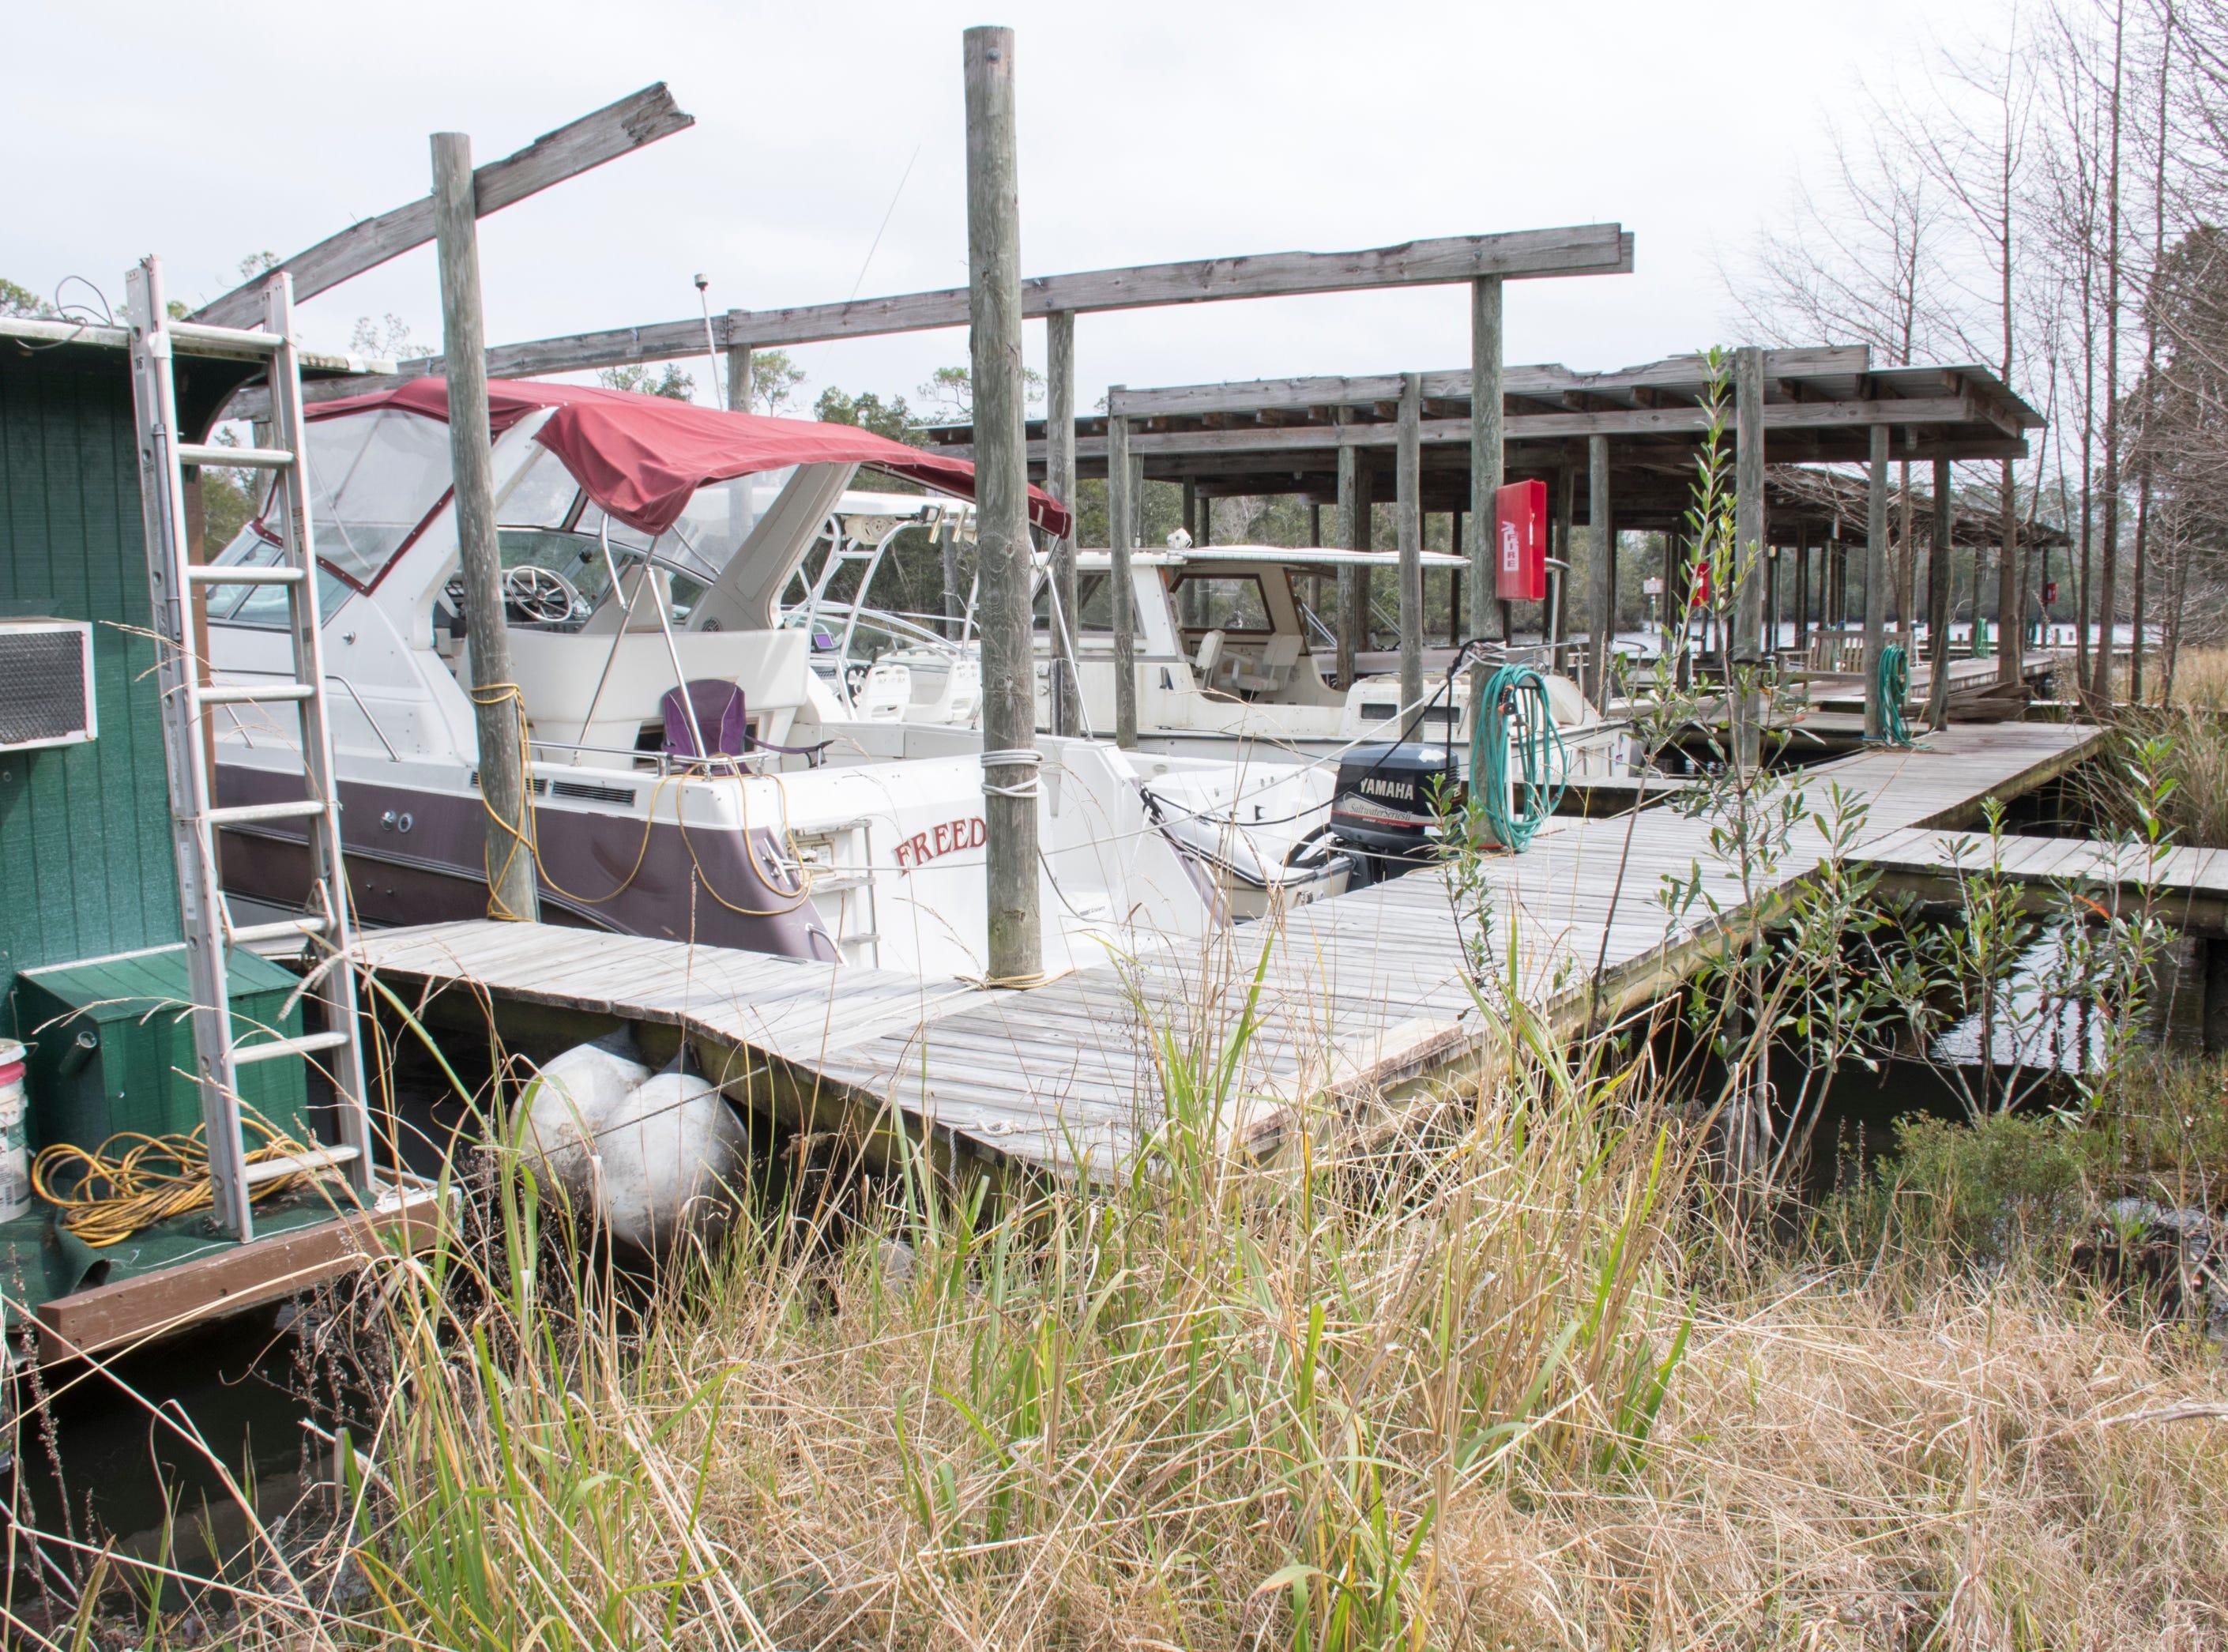 The Milton Marina in Milton on Wednesday, February 6, 2019.